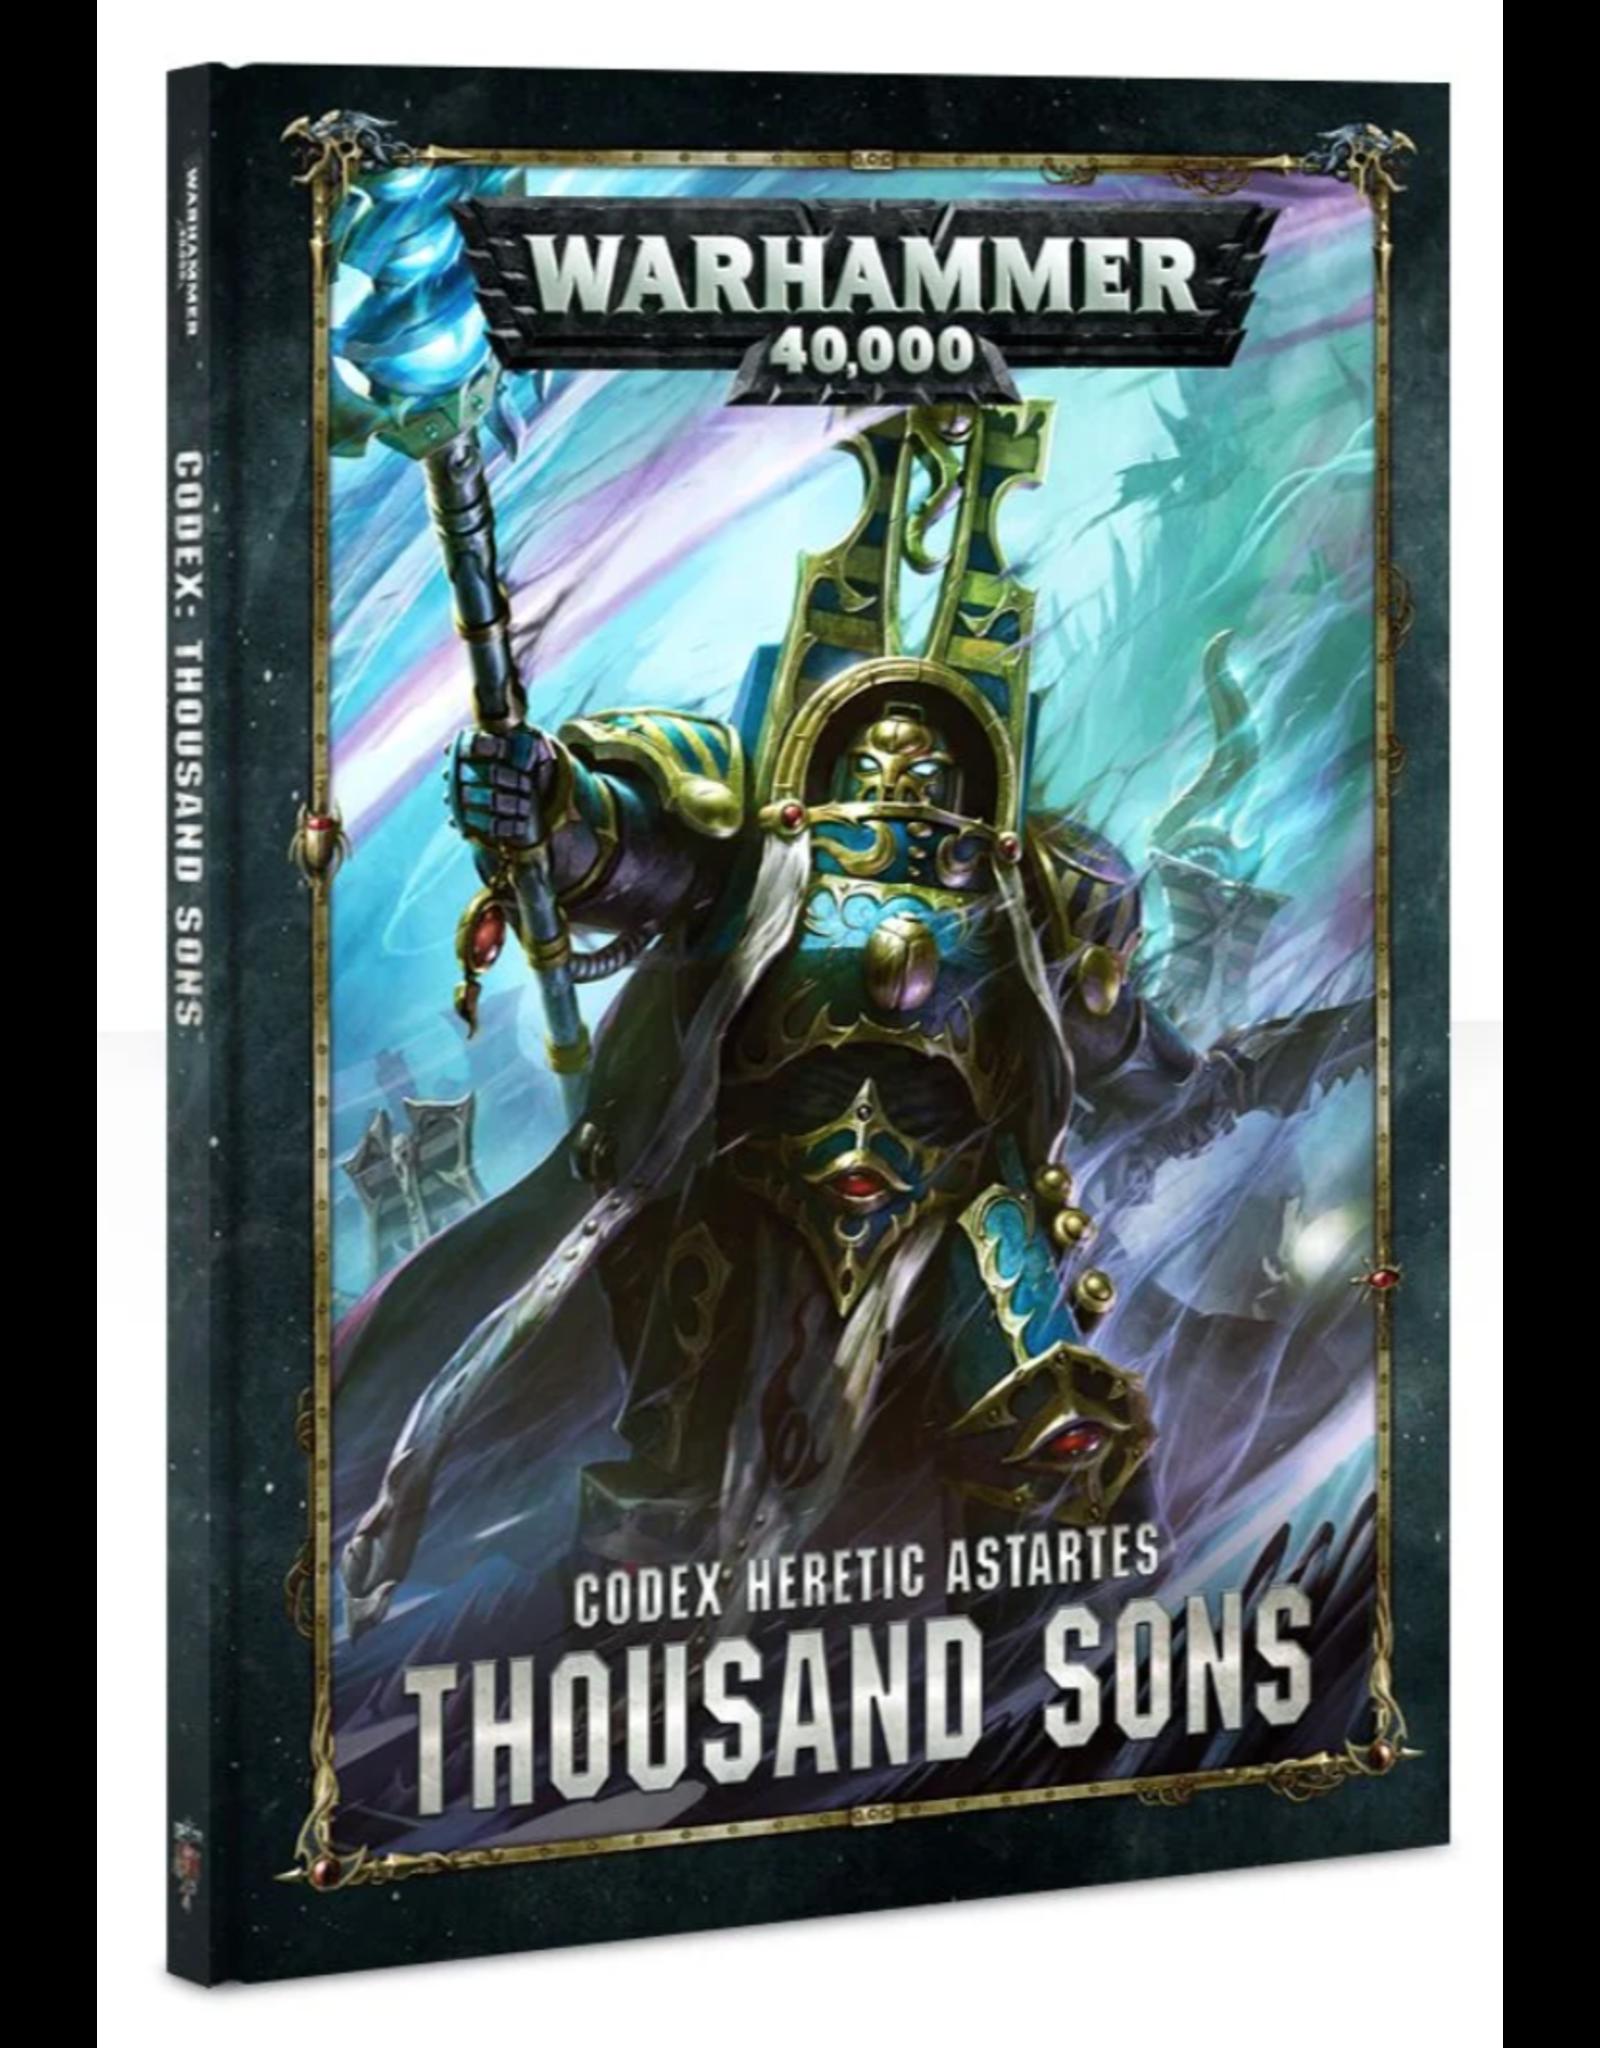 Warhammer 40K Codex: Thousand Sons (Chaos)